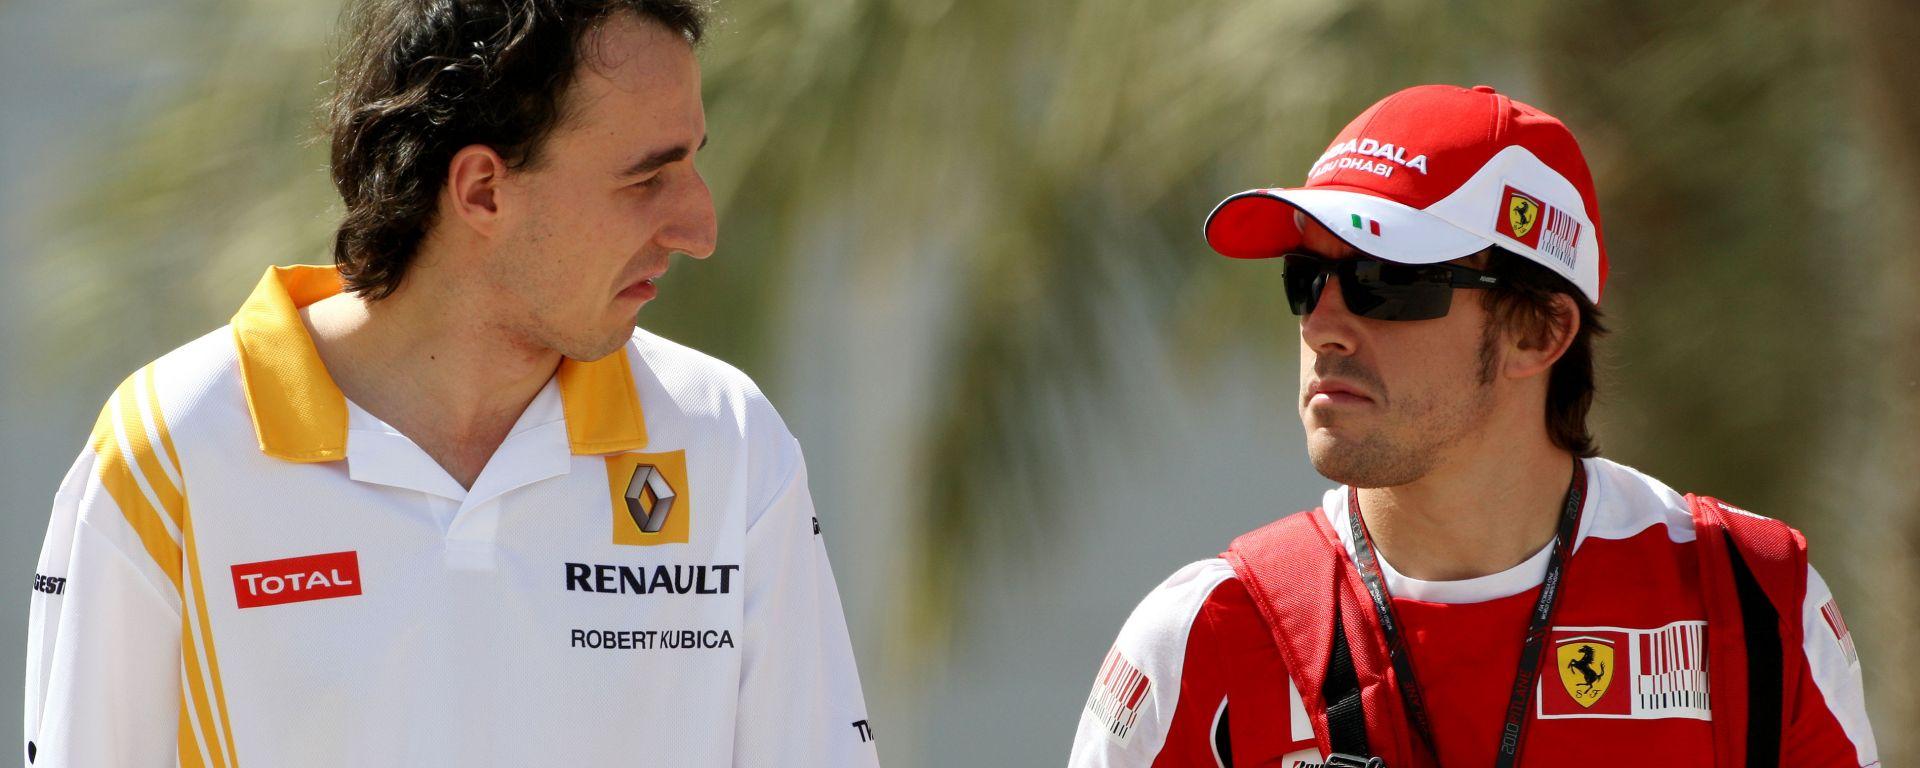 F1 GP Bahrain 2010, Sakhir: Robert Kubica (Renault) con Fernando Alonso (Ferrari)